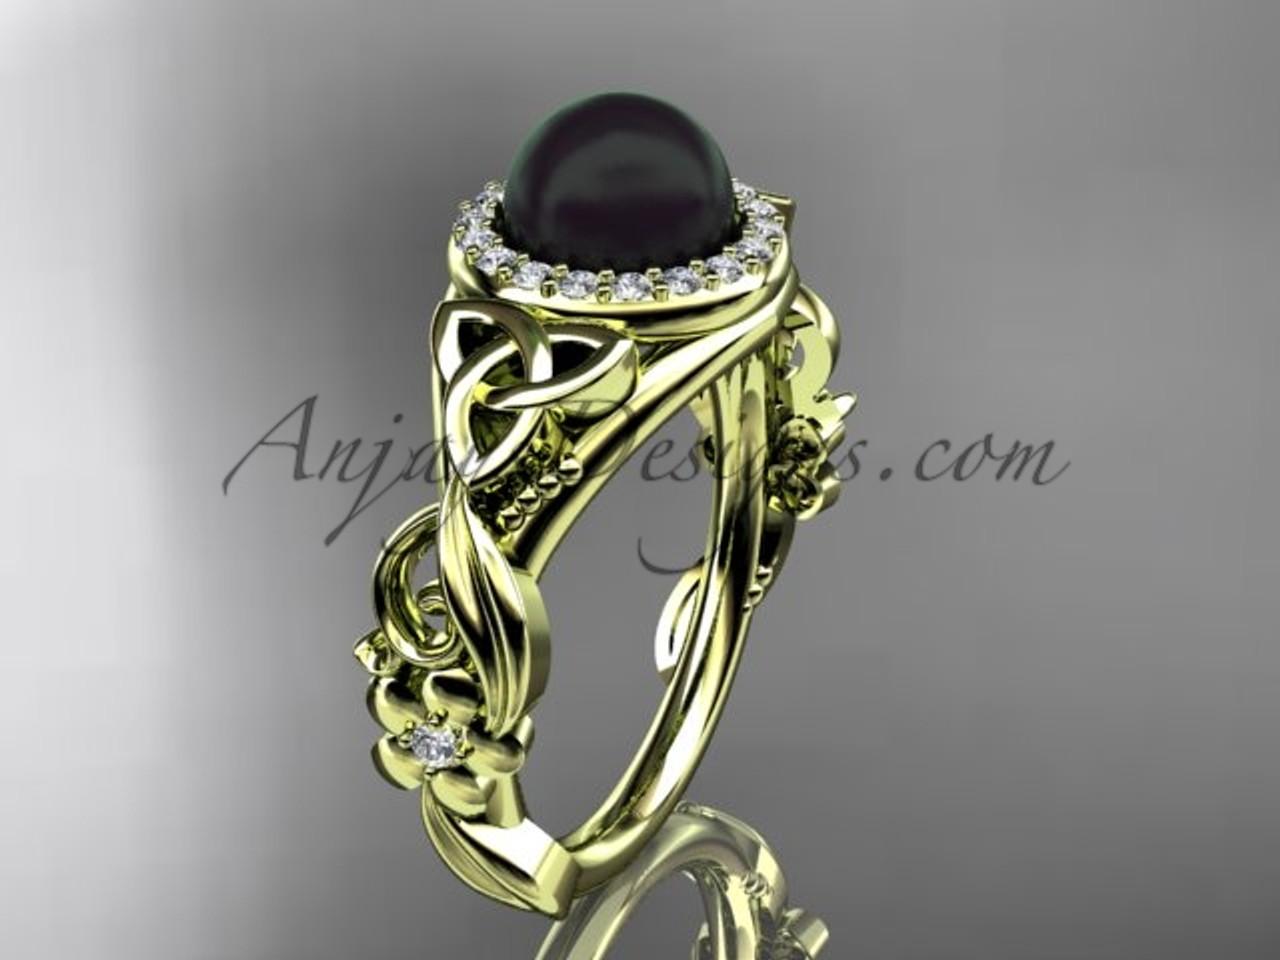 Halo Black Pearl Wedding Rings Yellow Gold Engagement Ring Ctbp7300